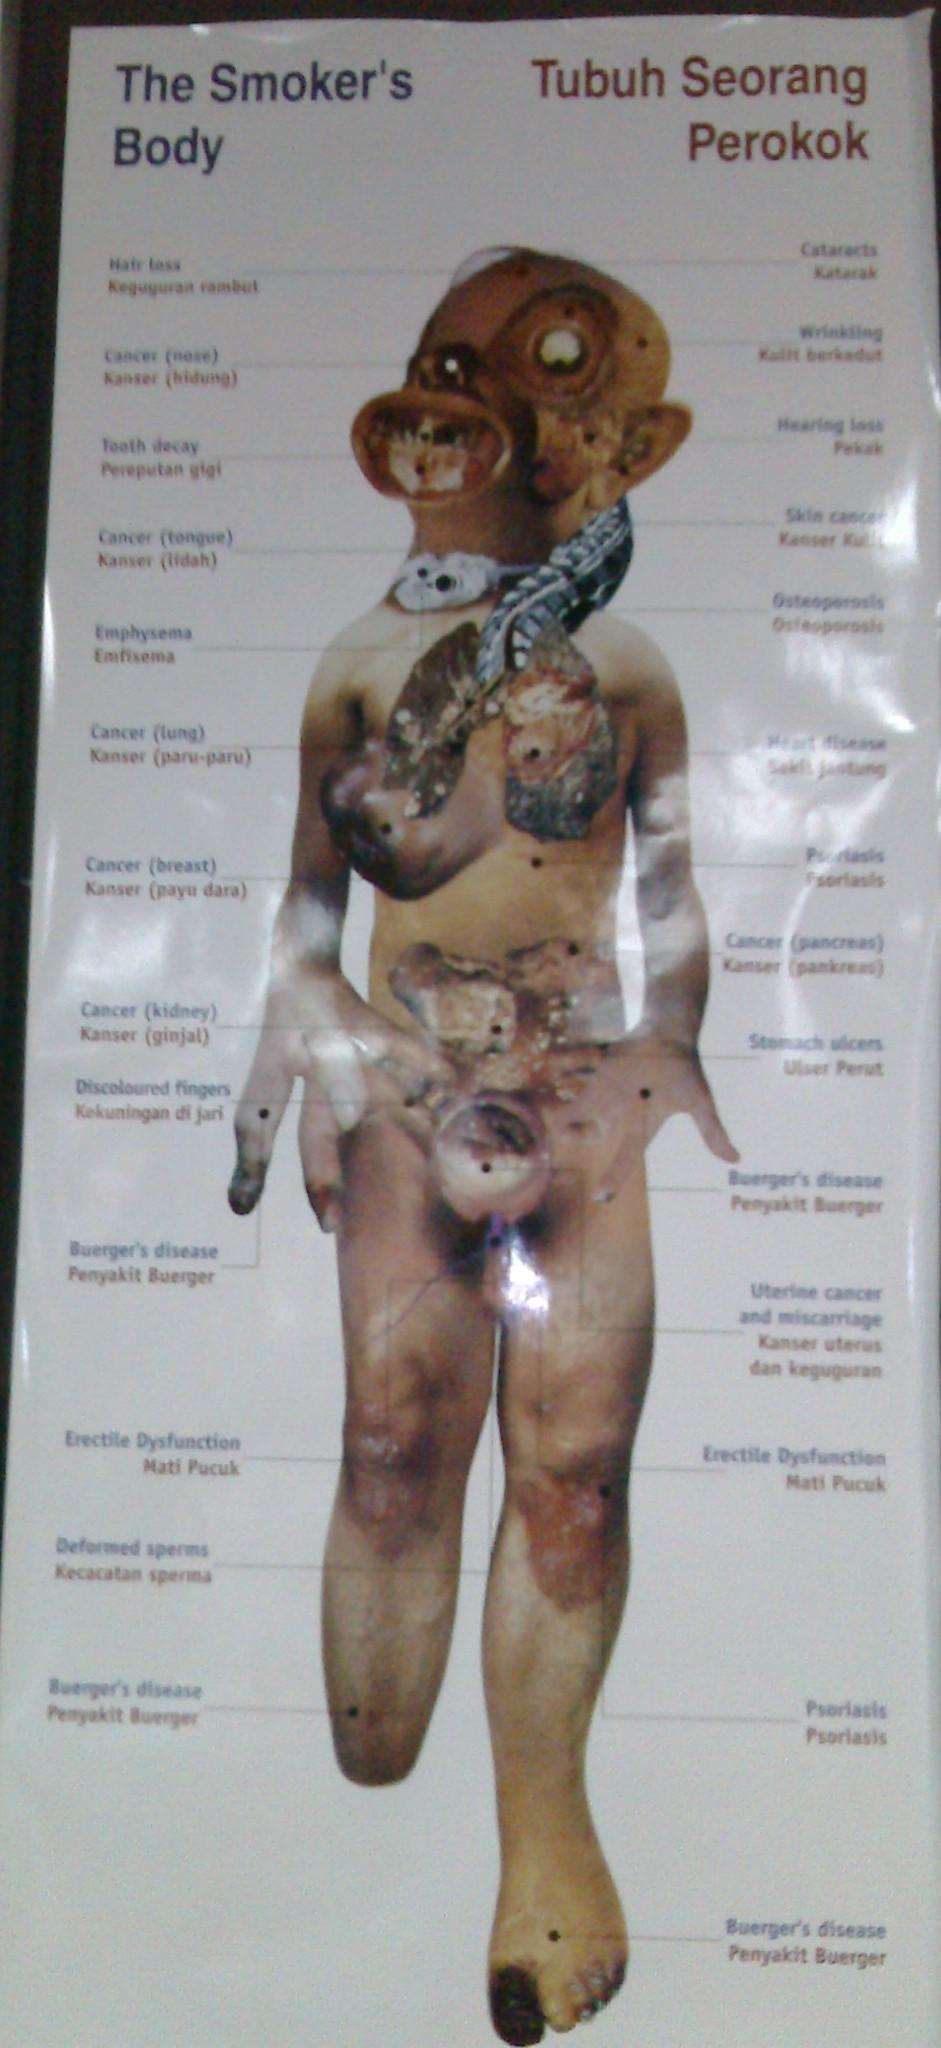 Anatomy of a smoker's body